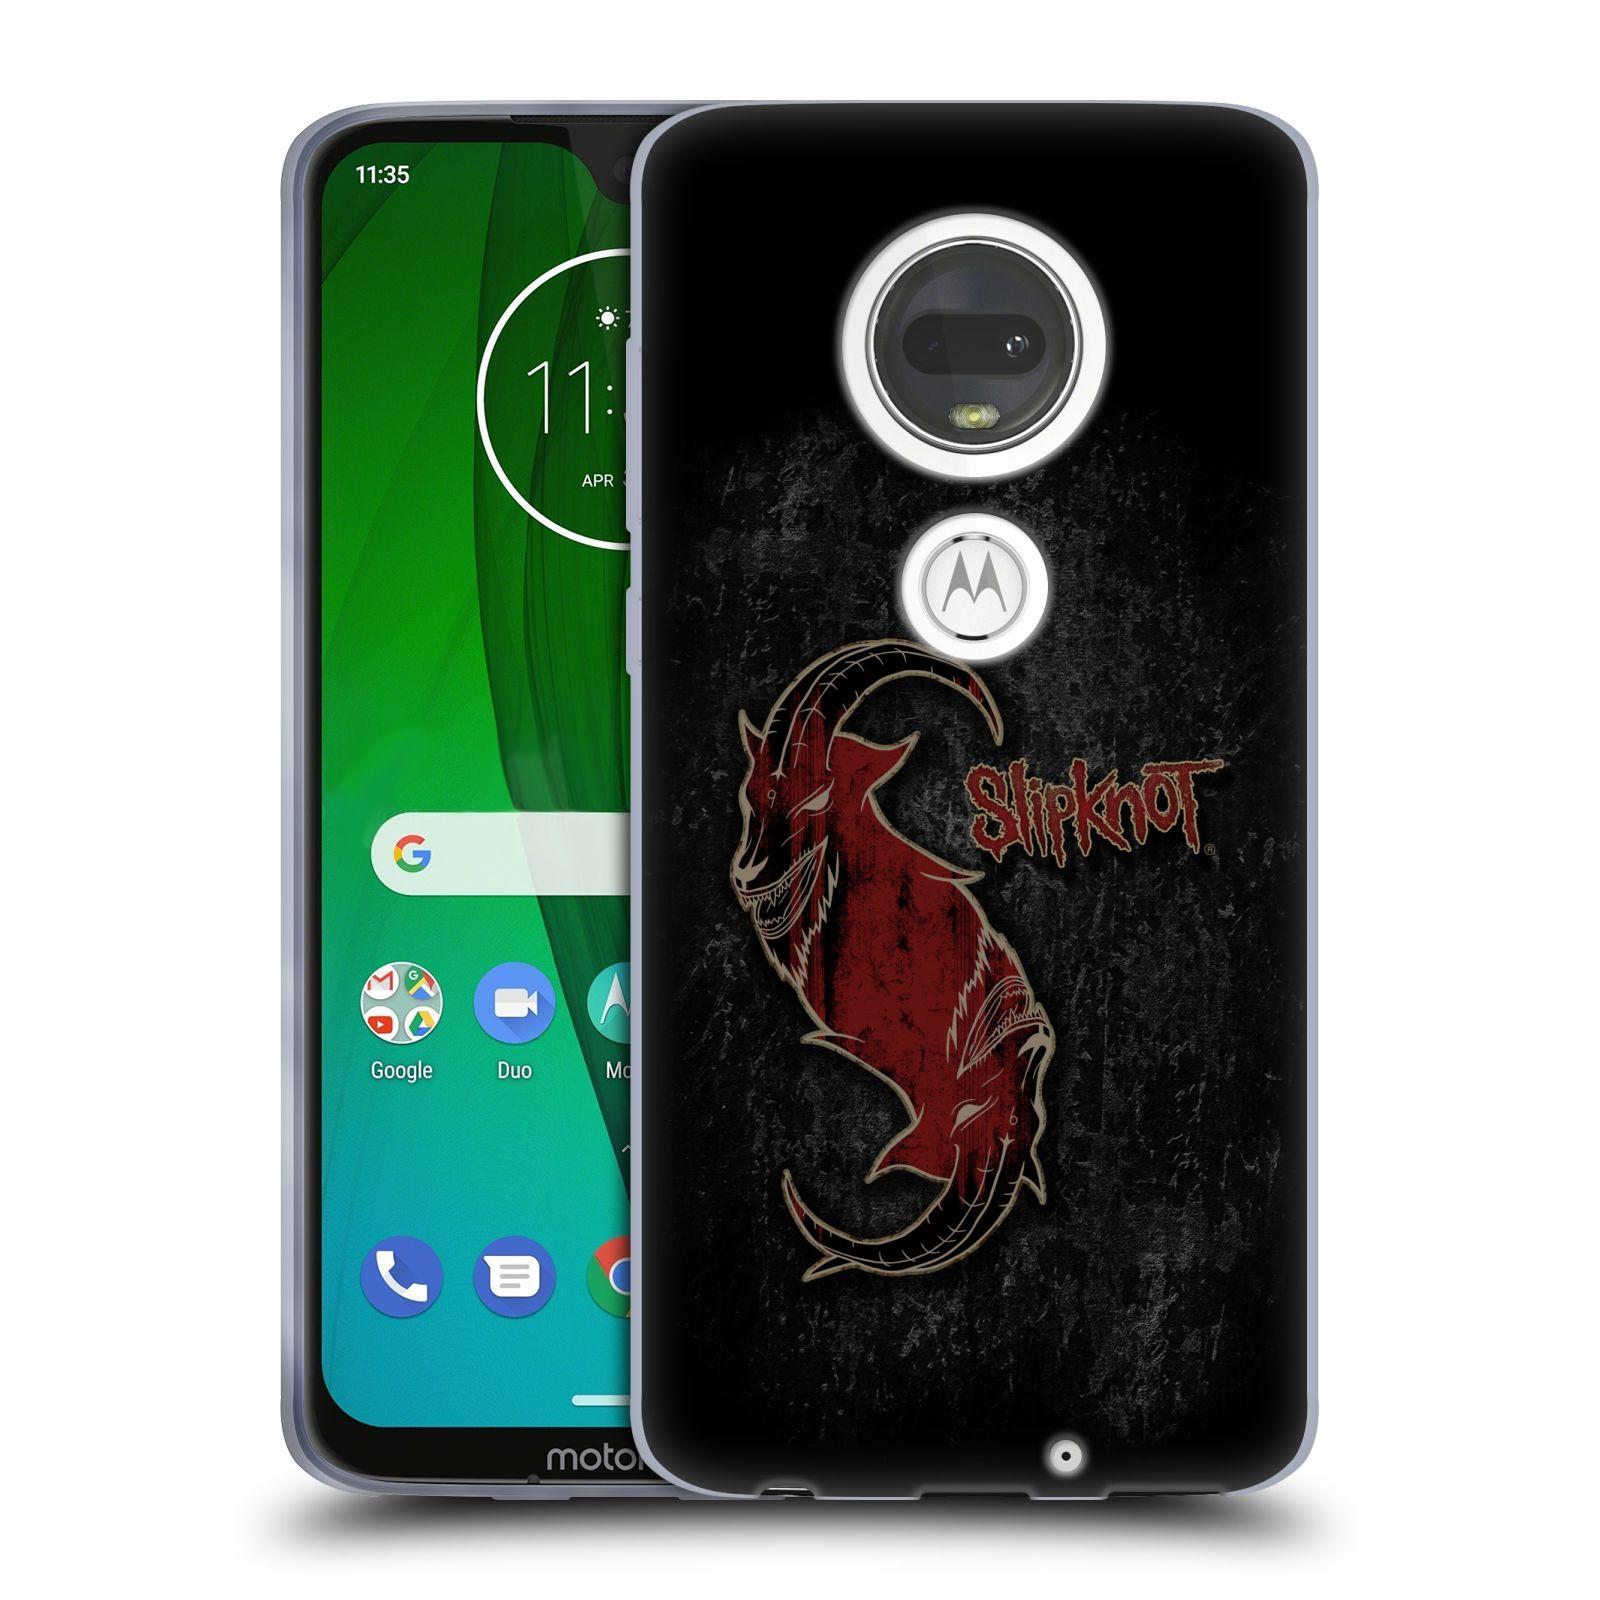 Silikonové pouzdro na mobil Motorola Moto G7 - Head Case - Slipknot - Rudý kozel